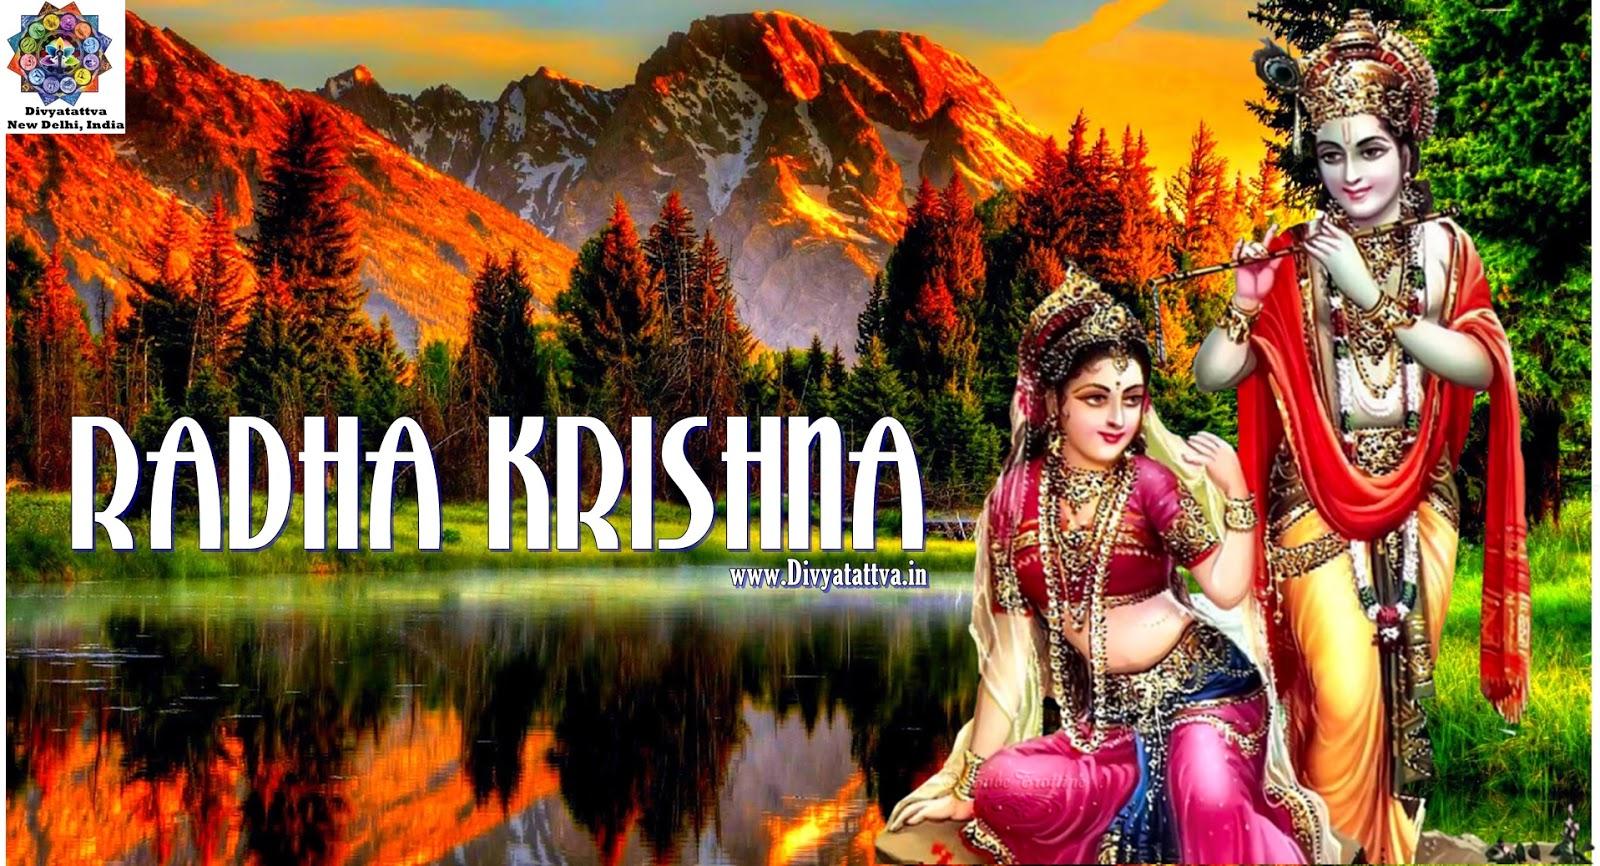 radha krishna indian gods 4k hindu images hinudism Beautiful Scenery Wallpapers www.divyatattva.in